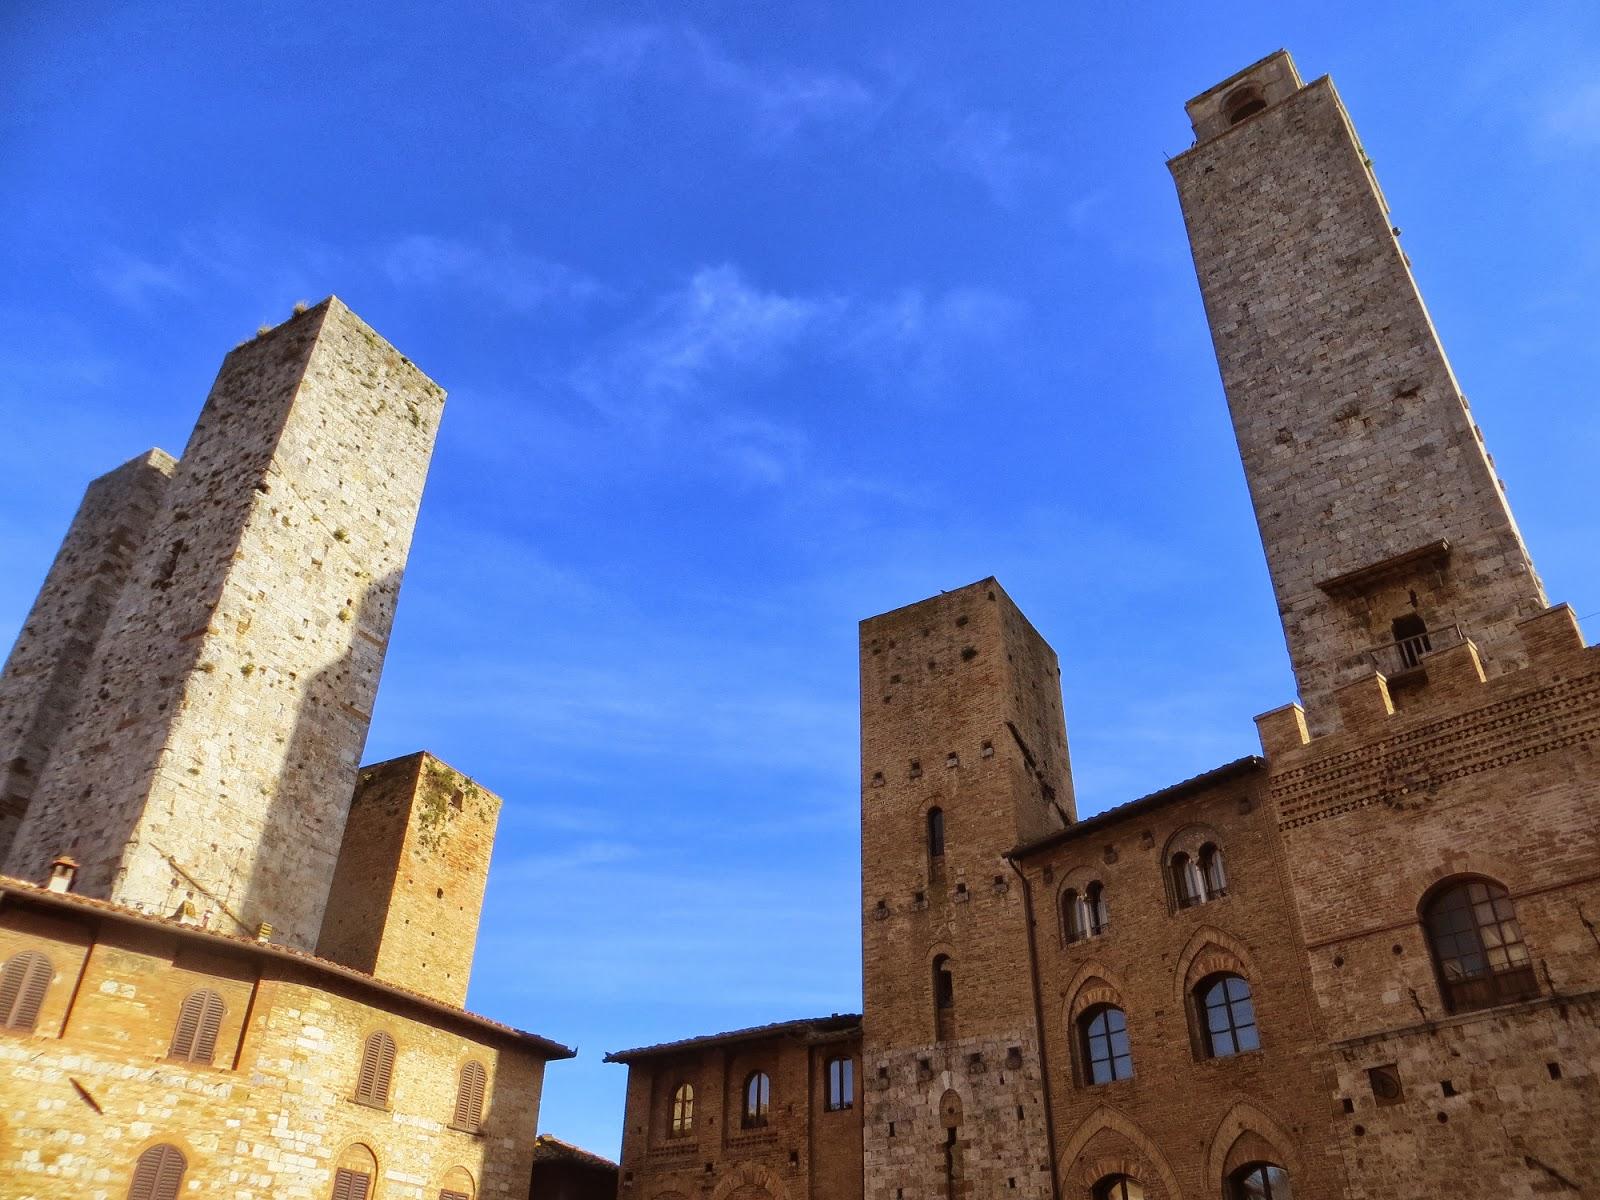 Towers of San Gimignano, Italy